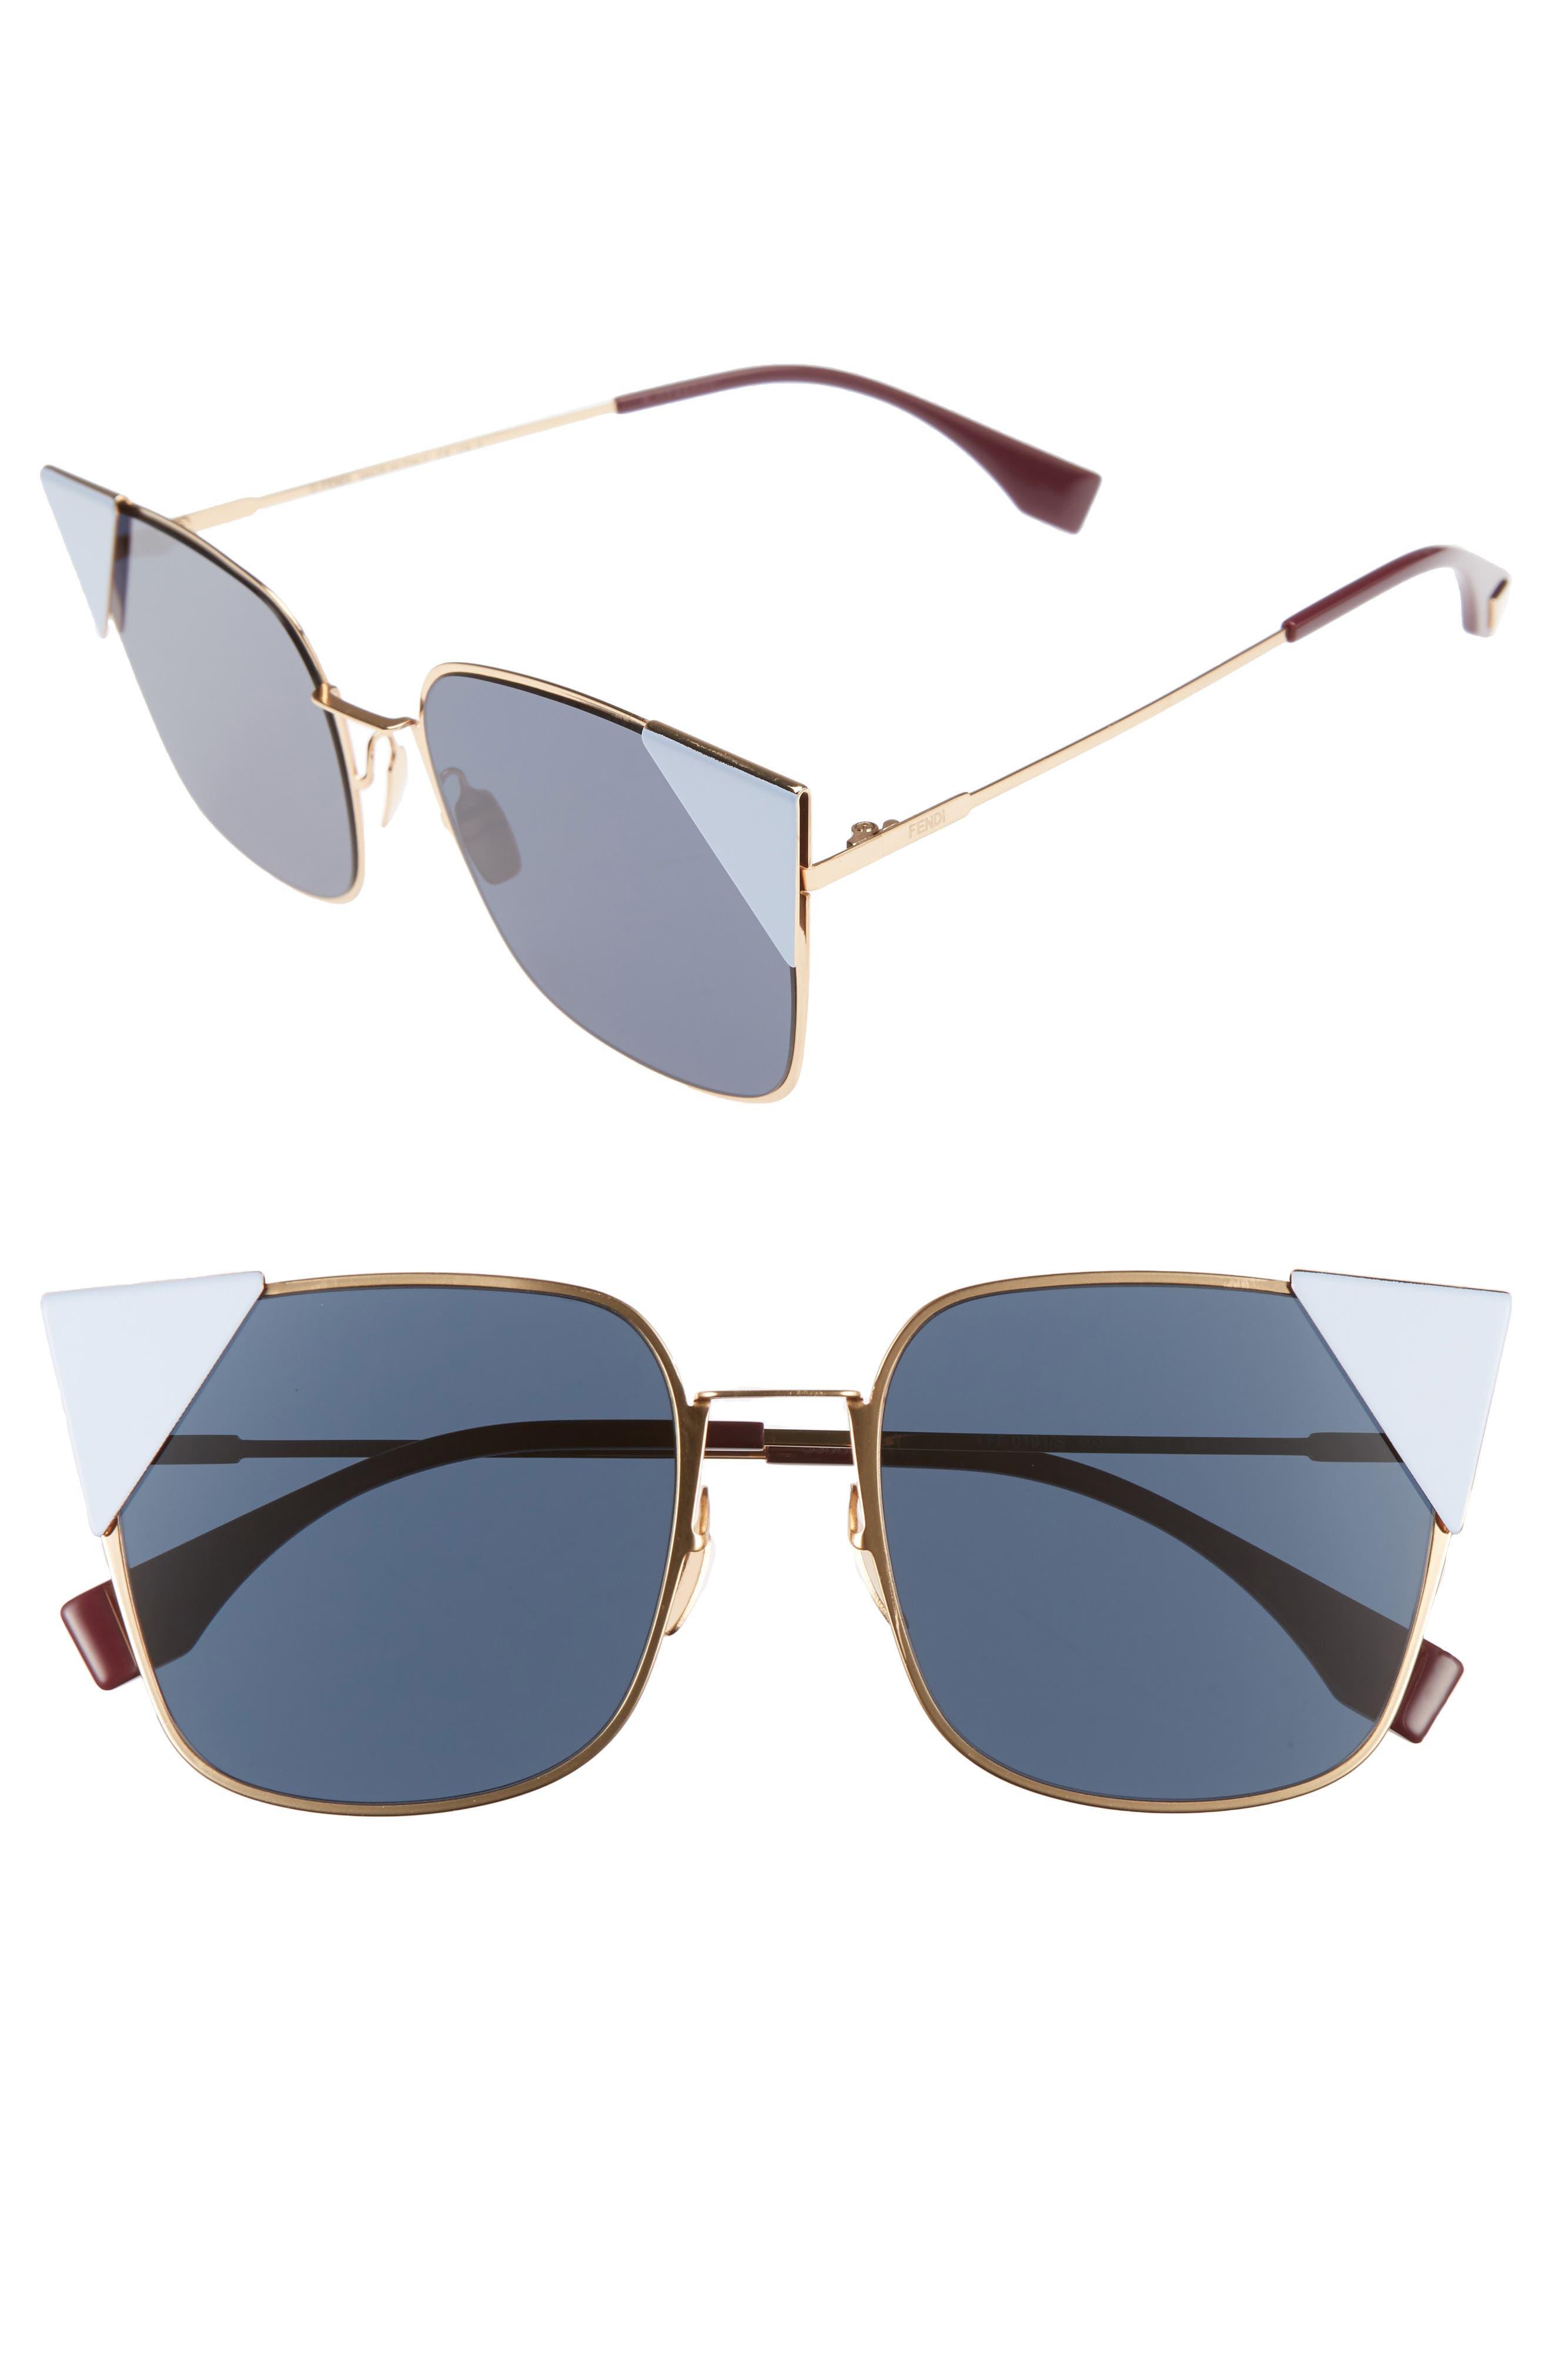 55mm Tipped Cat Eye Sunglasses,                             Alternate thumbnail 2, color,                             ROSE METALLIC GOLD